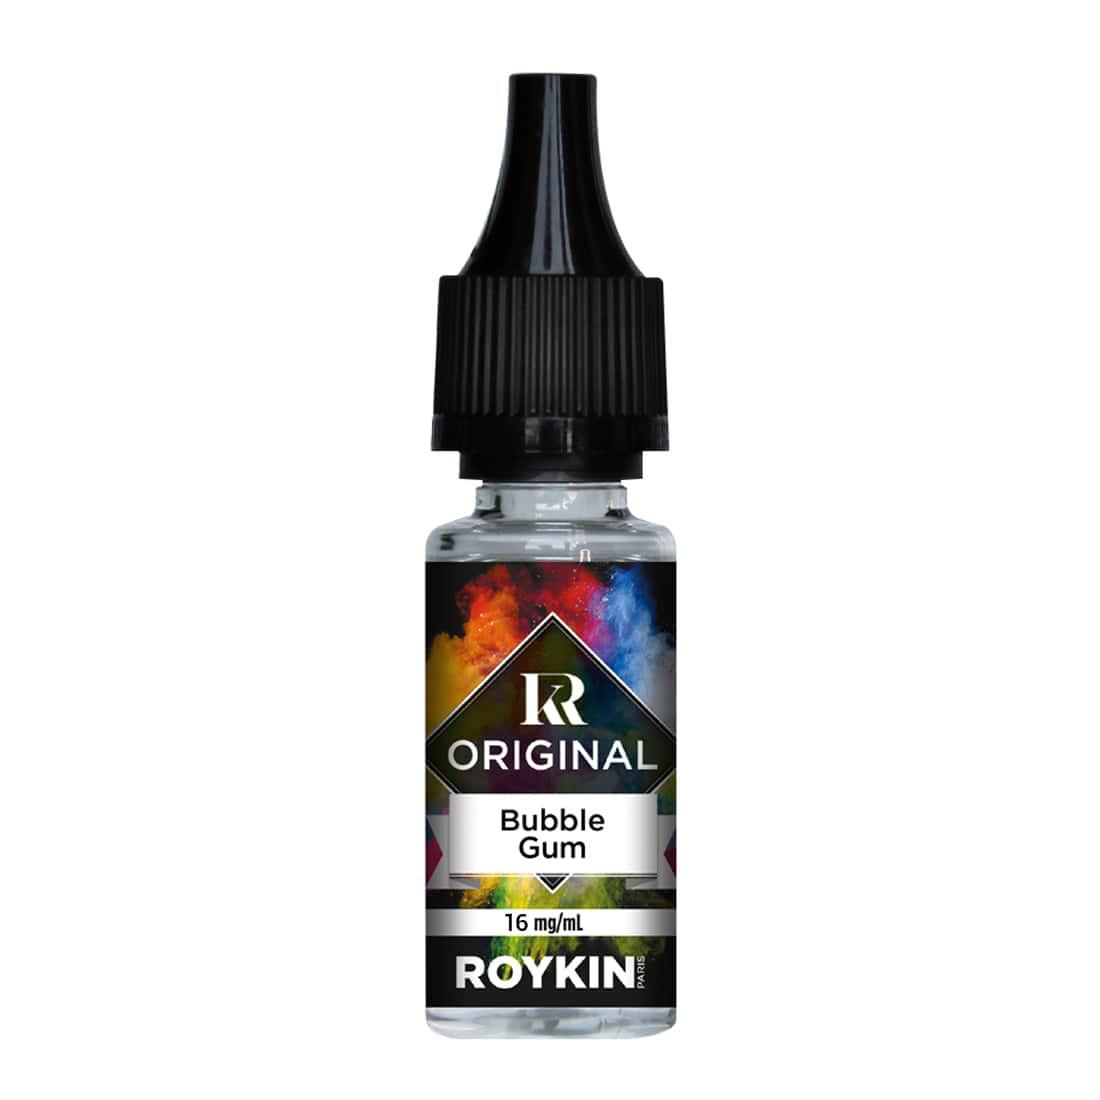 Photo #4 de E liquide Roykin Original Bubble Gum